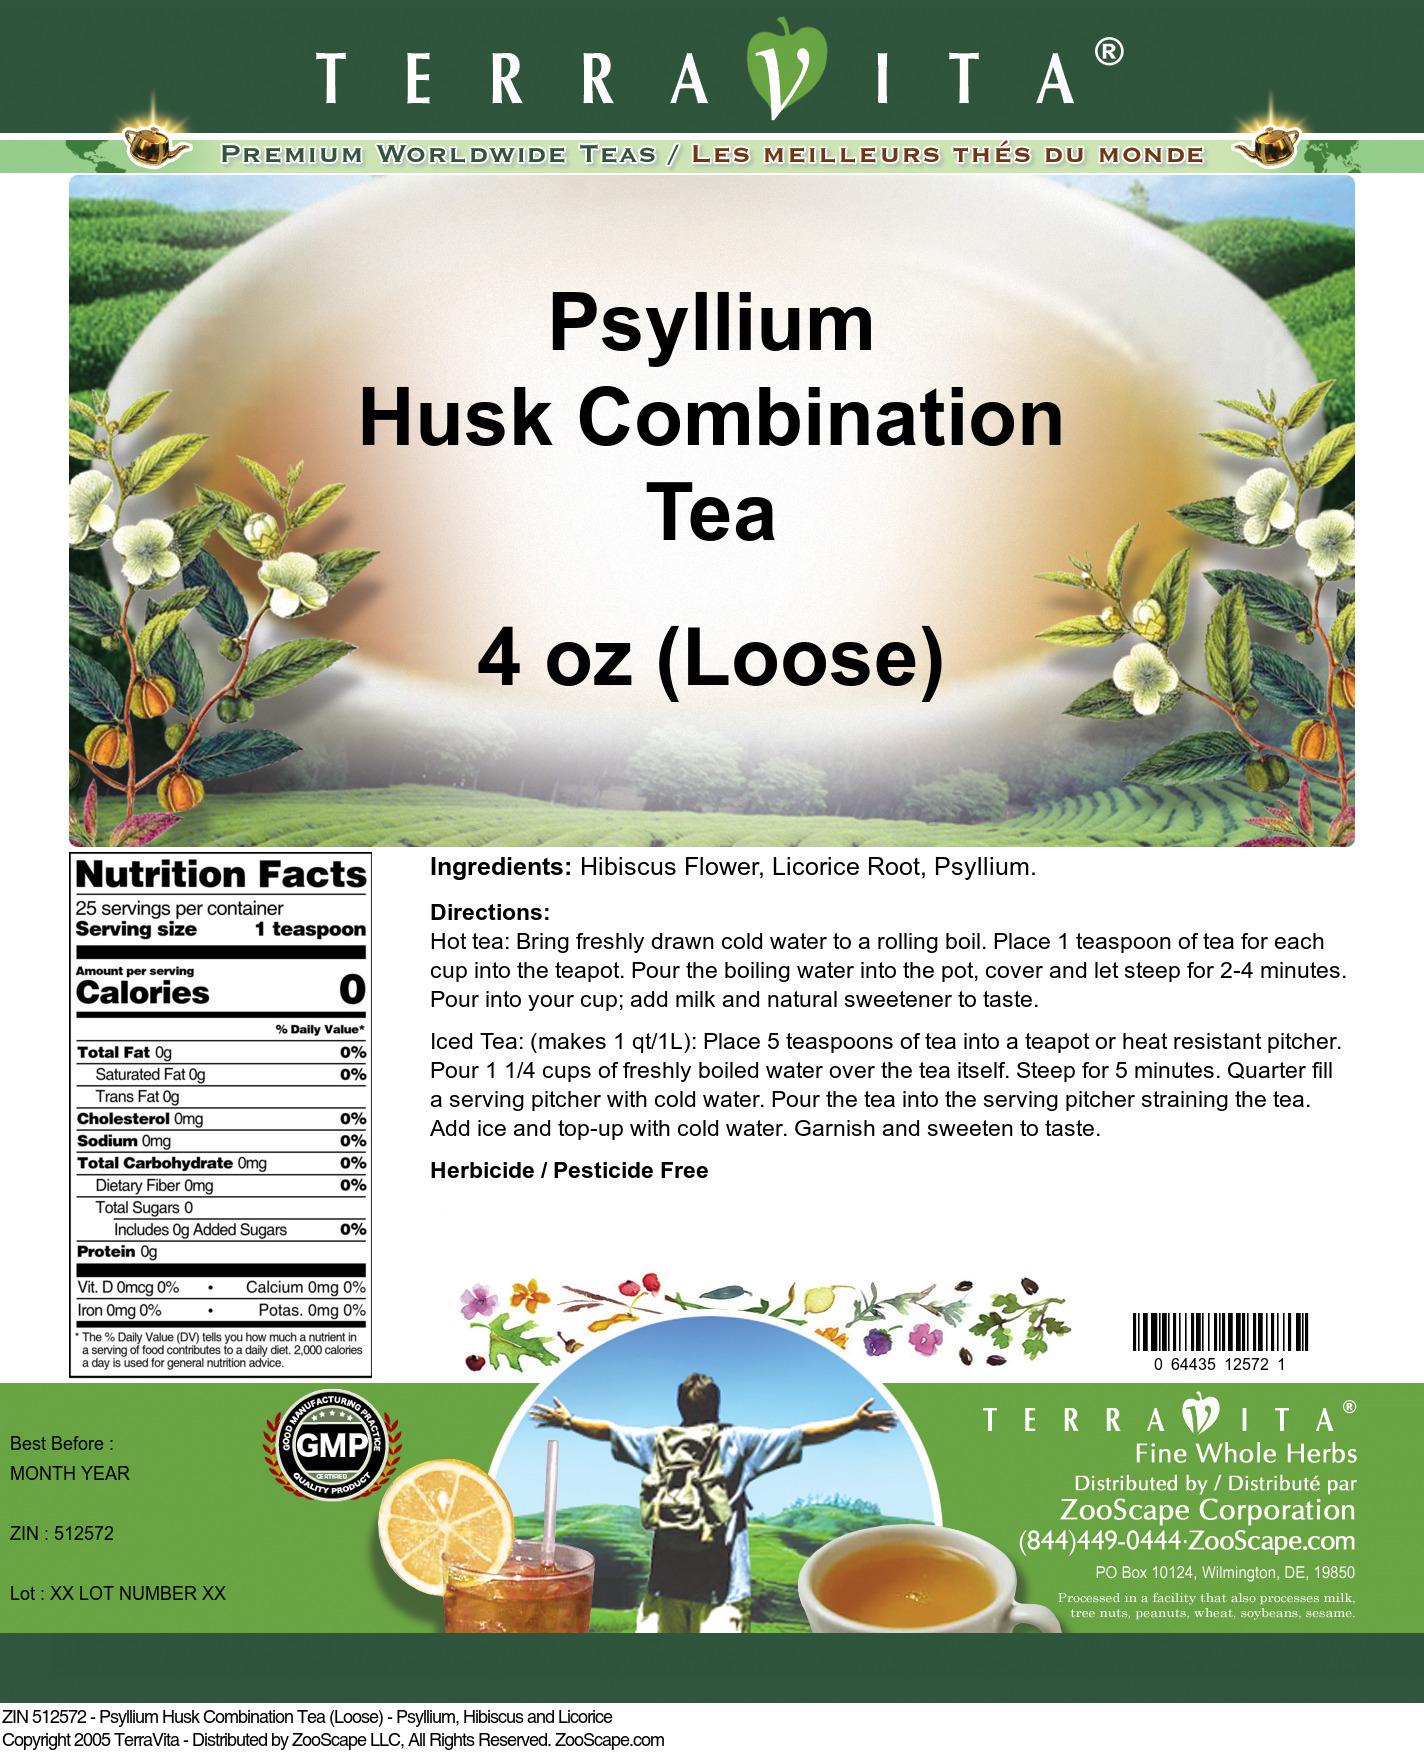 Psyllium Husk Combination Tea (Loose) - Psyllium, Hibiscus and Licorice